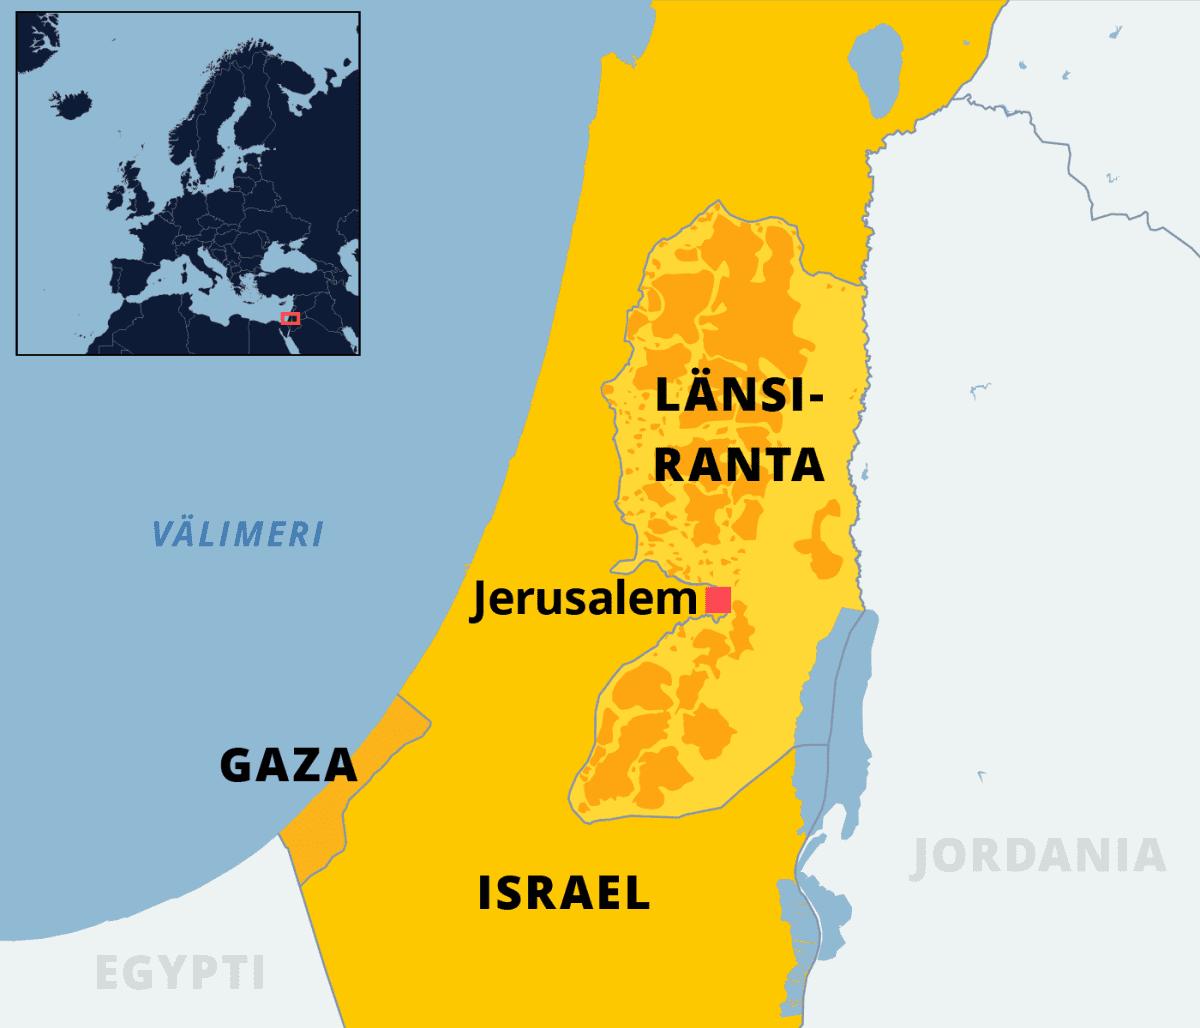 Kartalla Israel, Länsiranta ja Gaza.